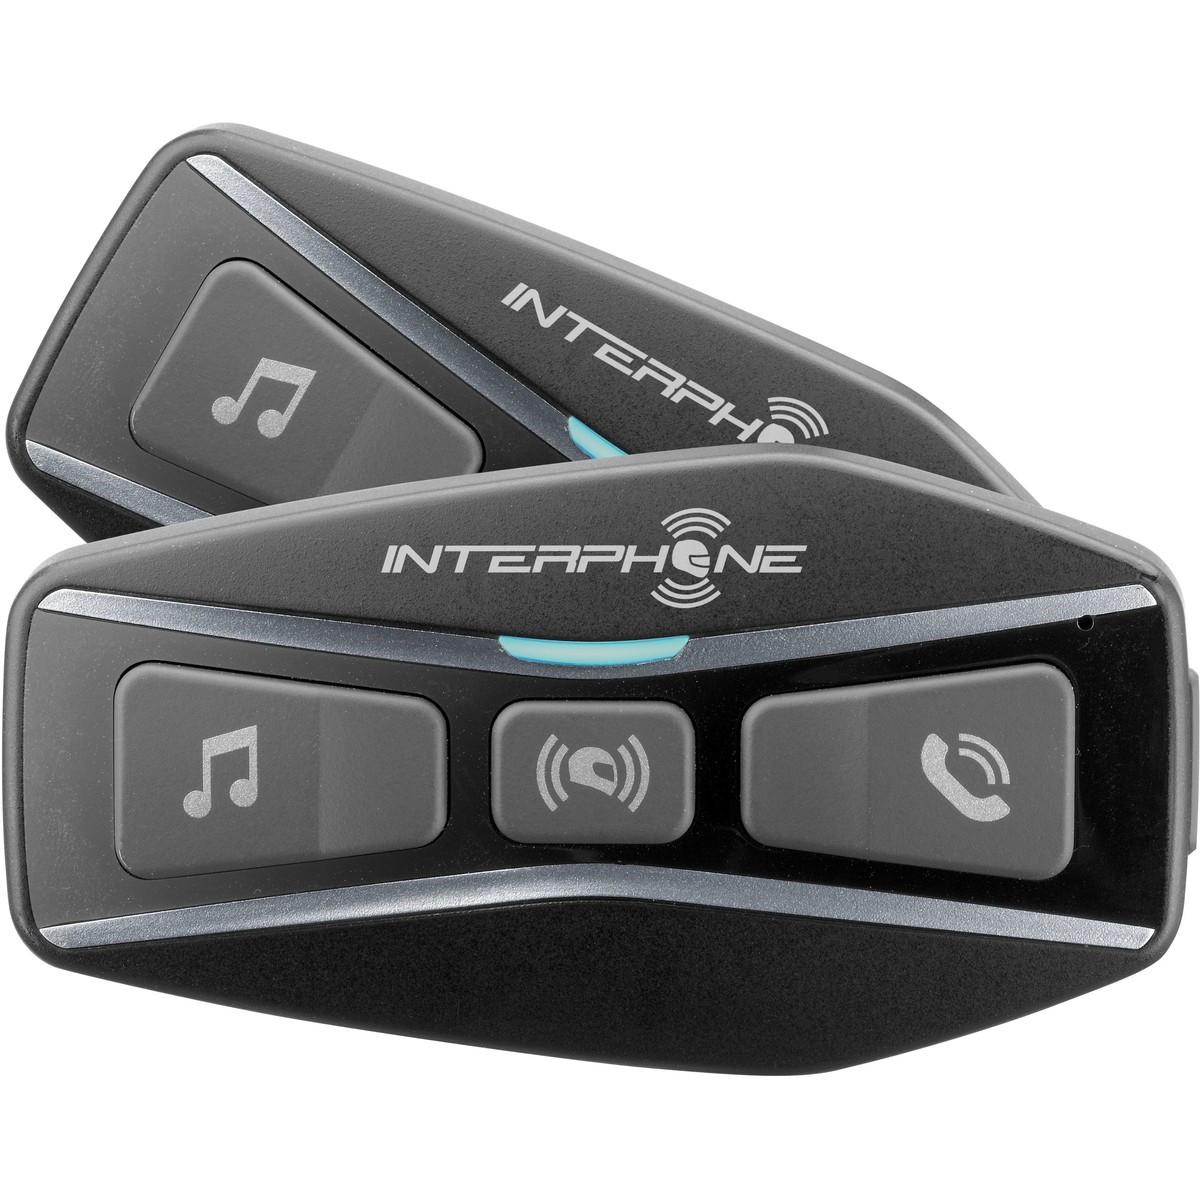 INTERPHONE U-Com 4 tupla pack, Kypäräpuhelin